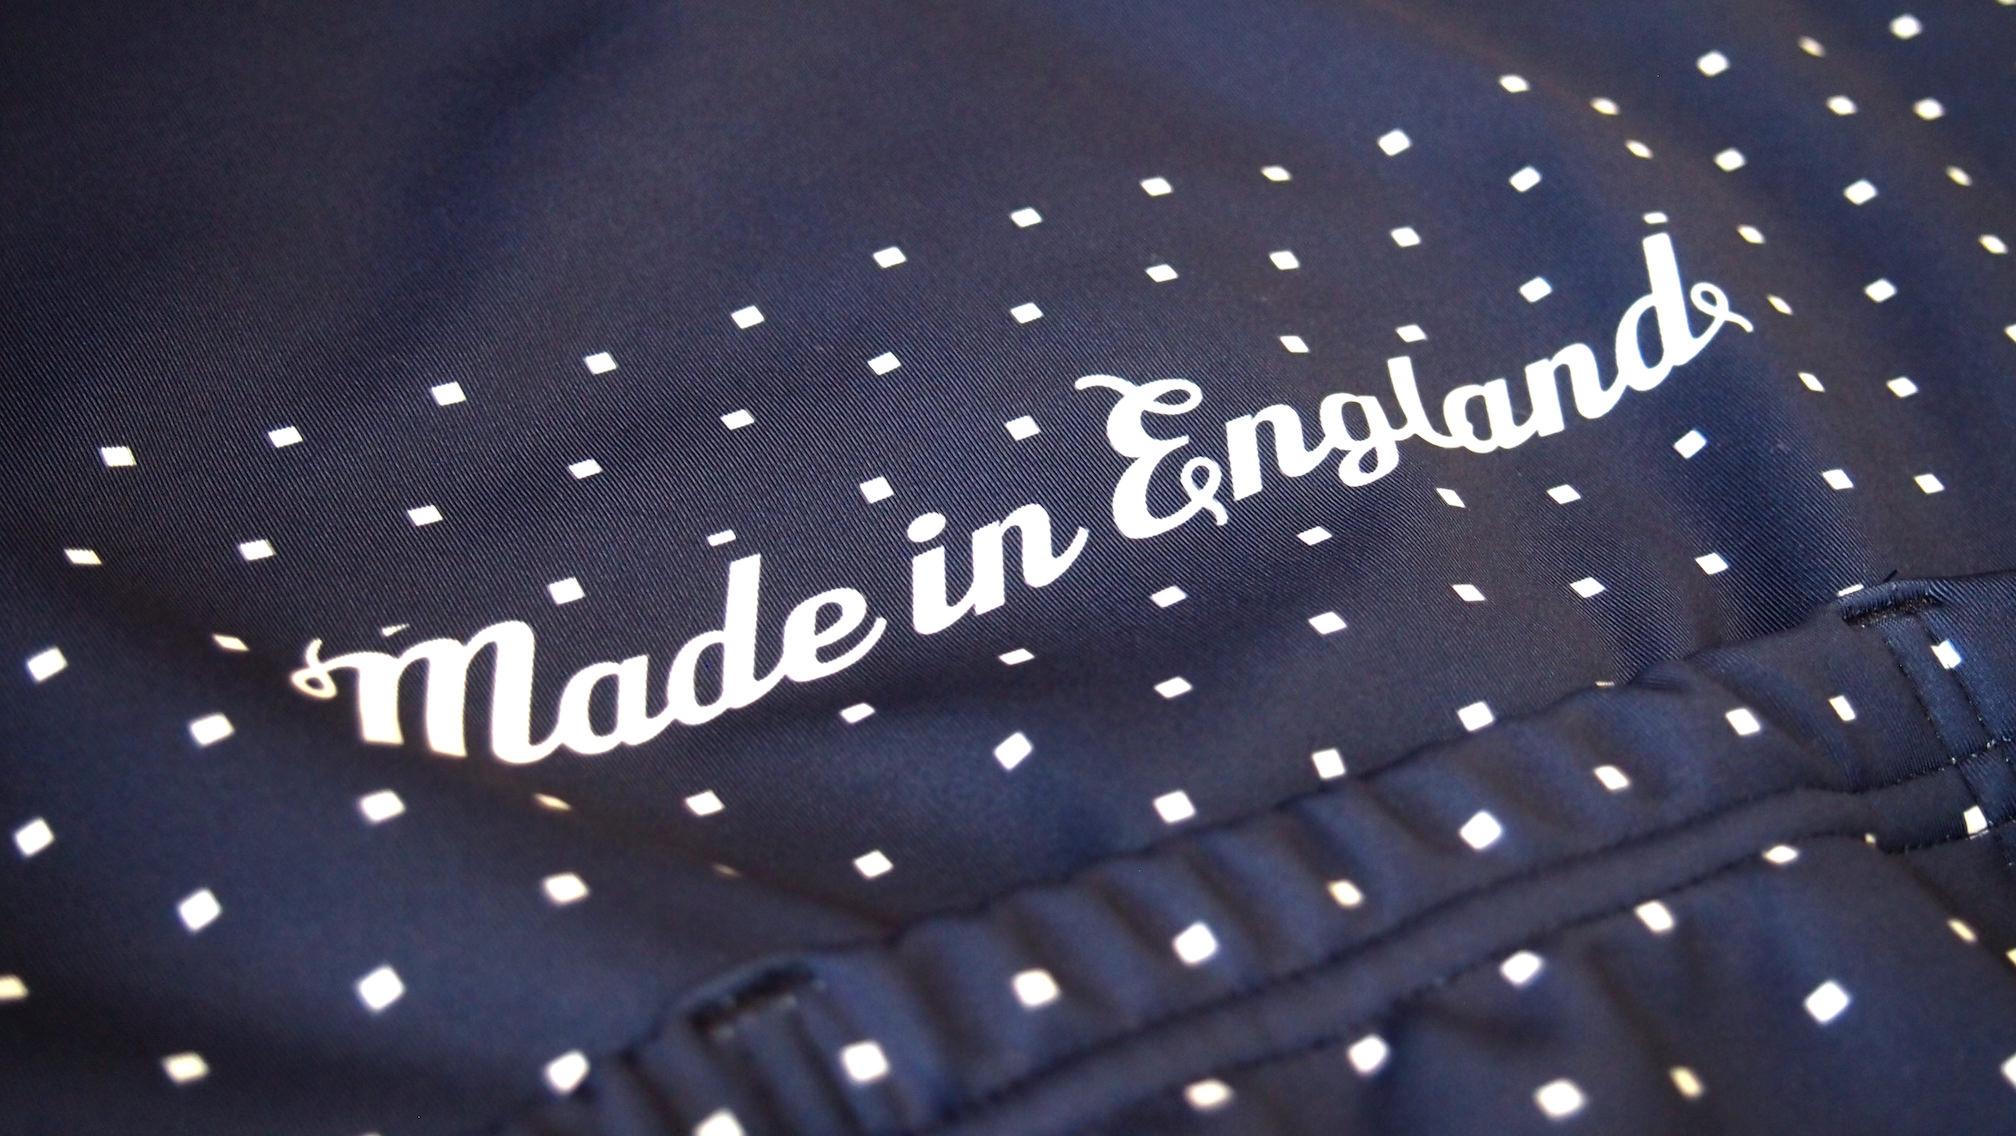 HackneyGT made in england